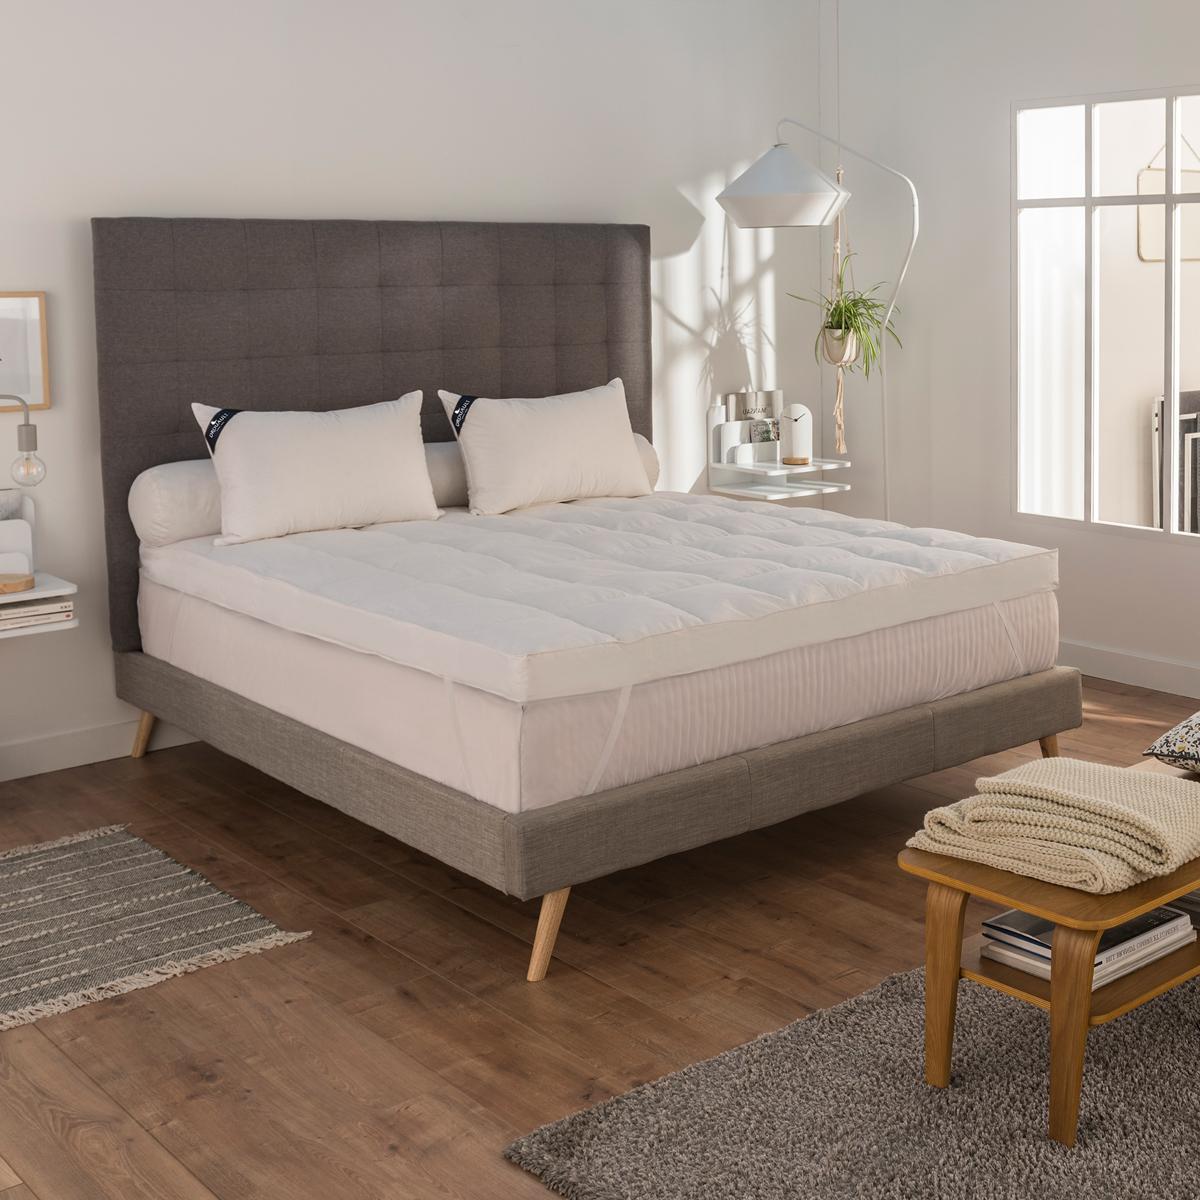 Surconfort de Matelas Haut Luxe Pro 90x200 cm